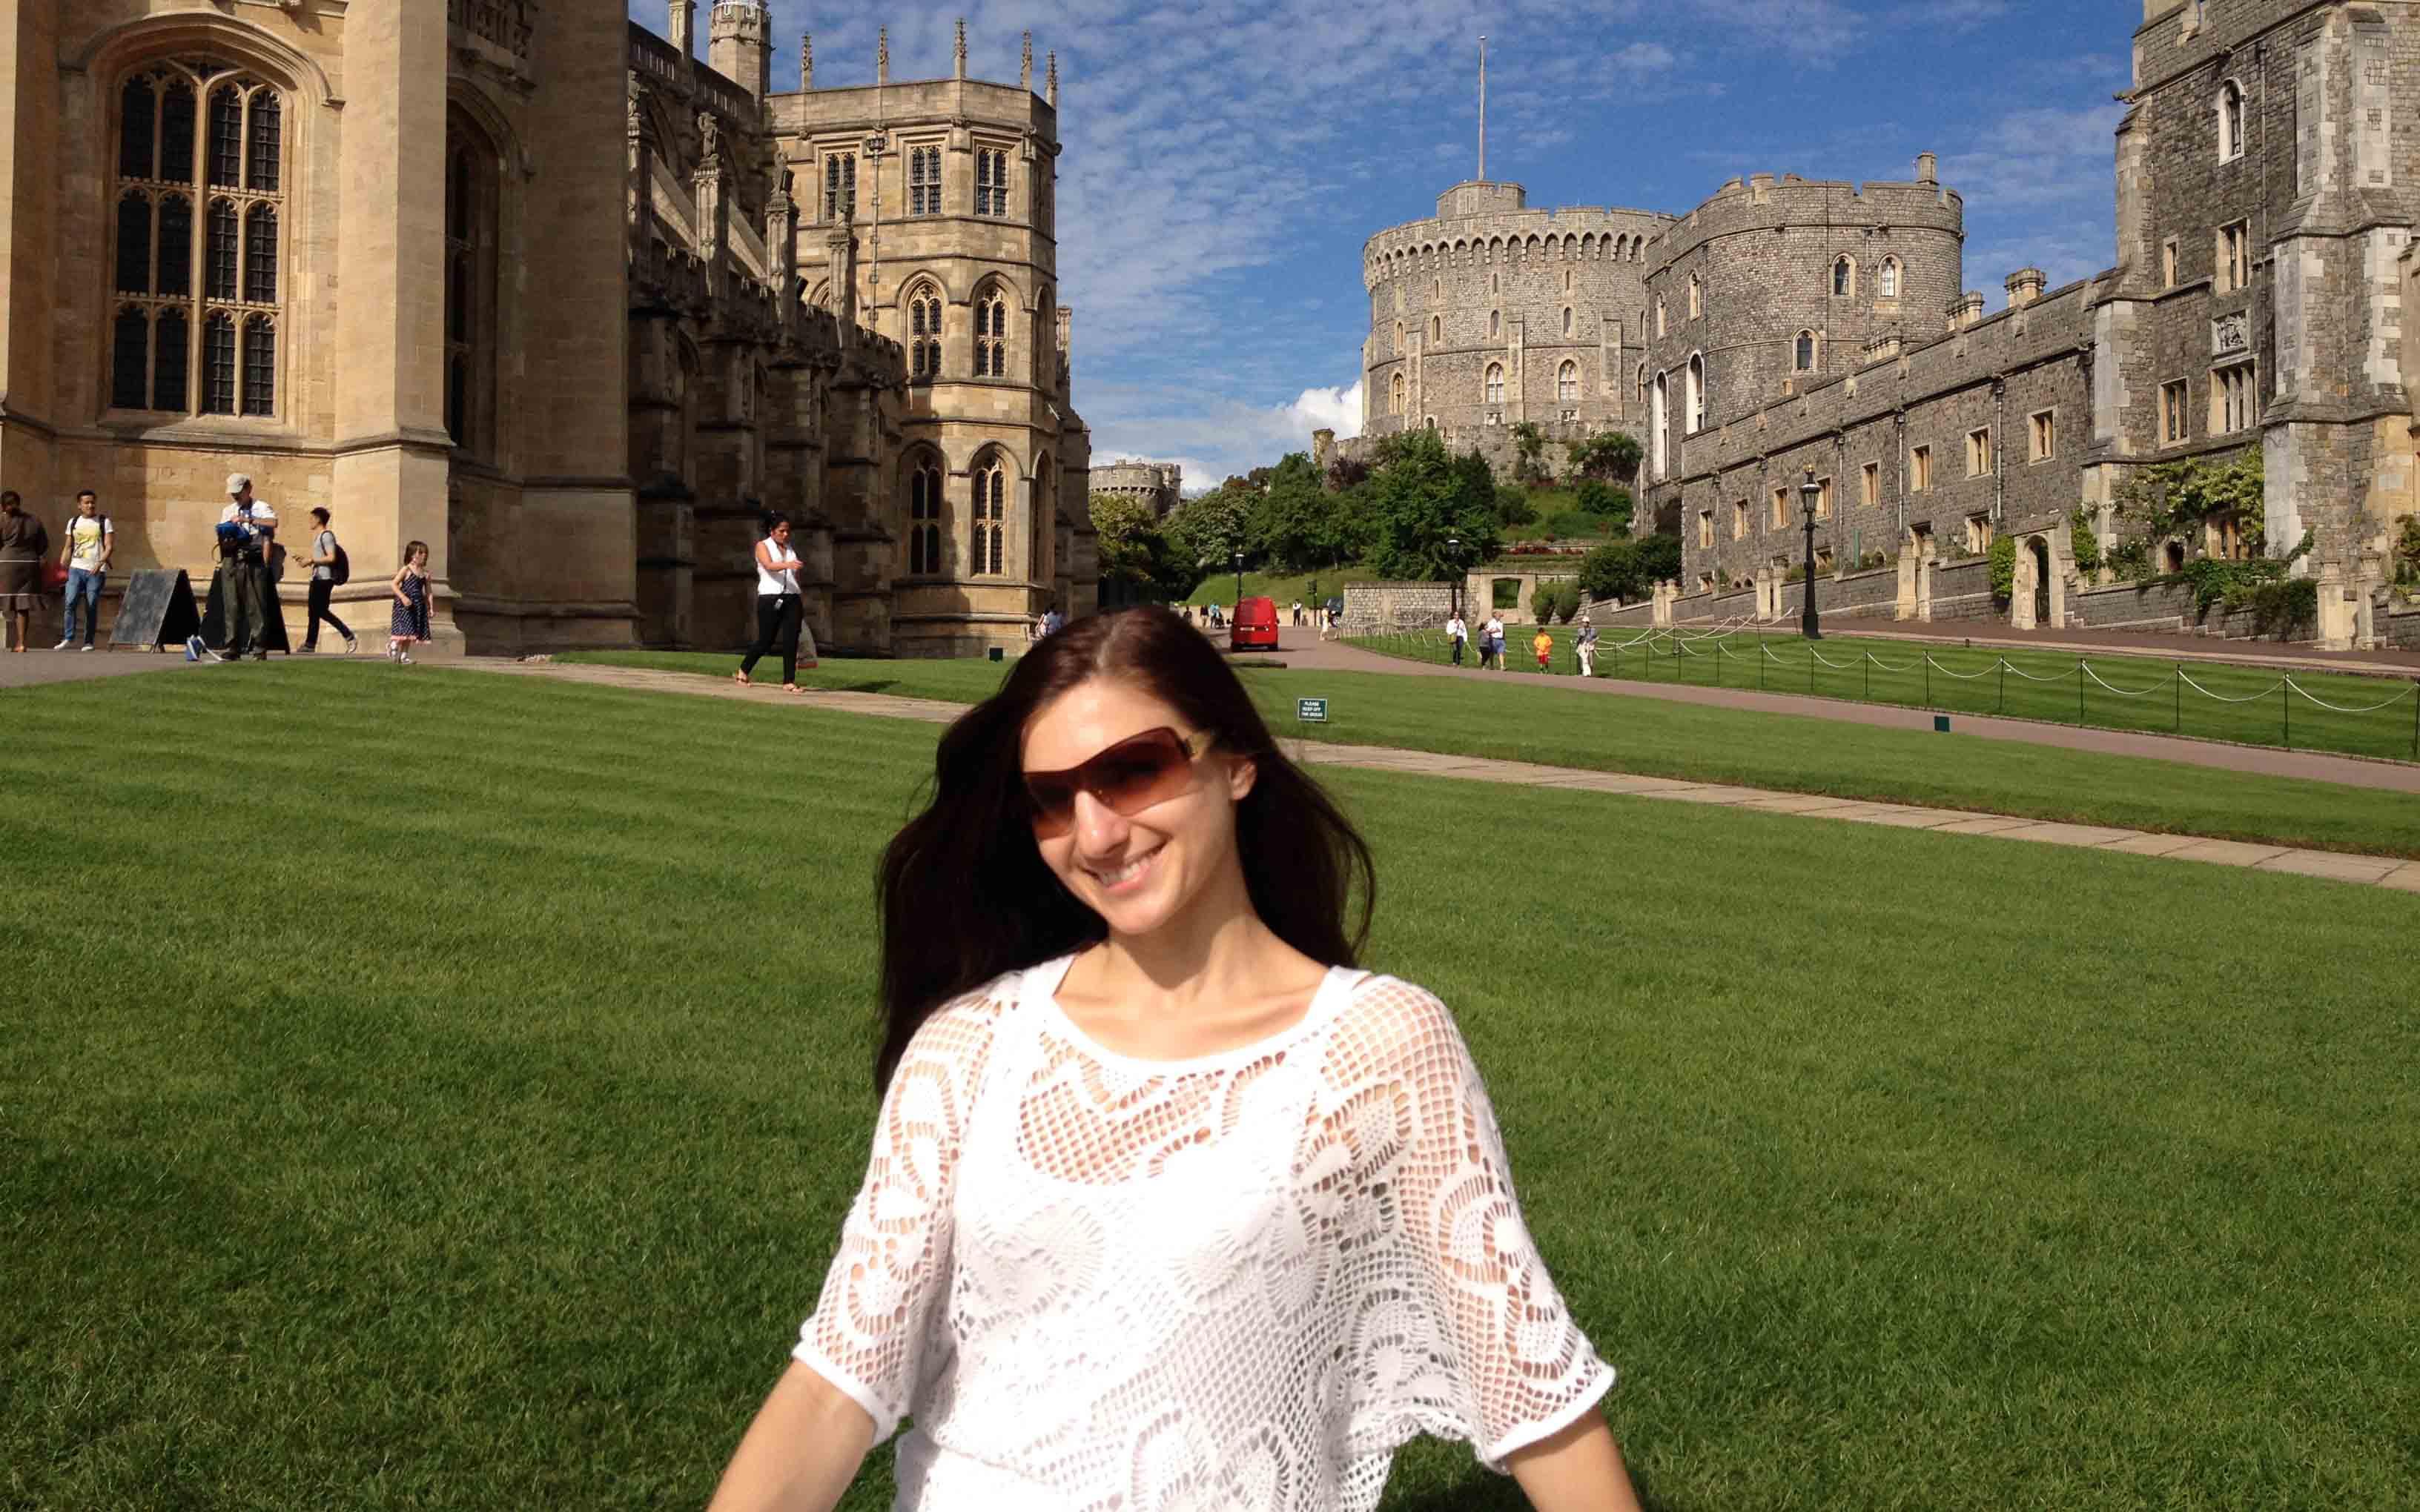 Jane Teitge Windsor Castle, UK